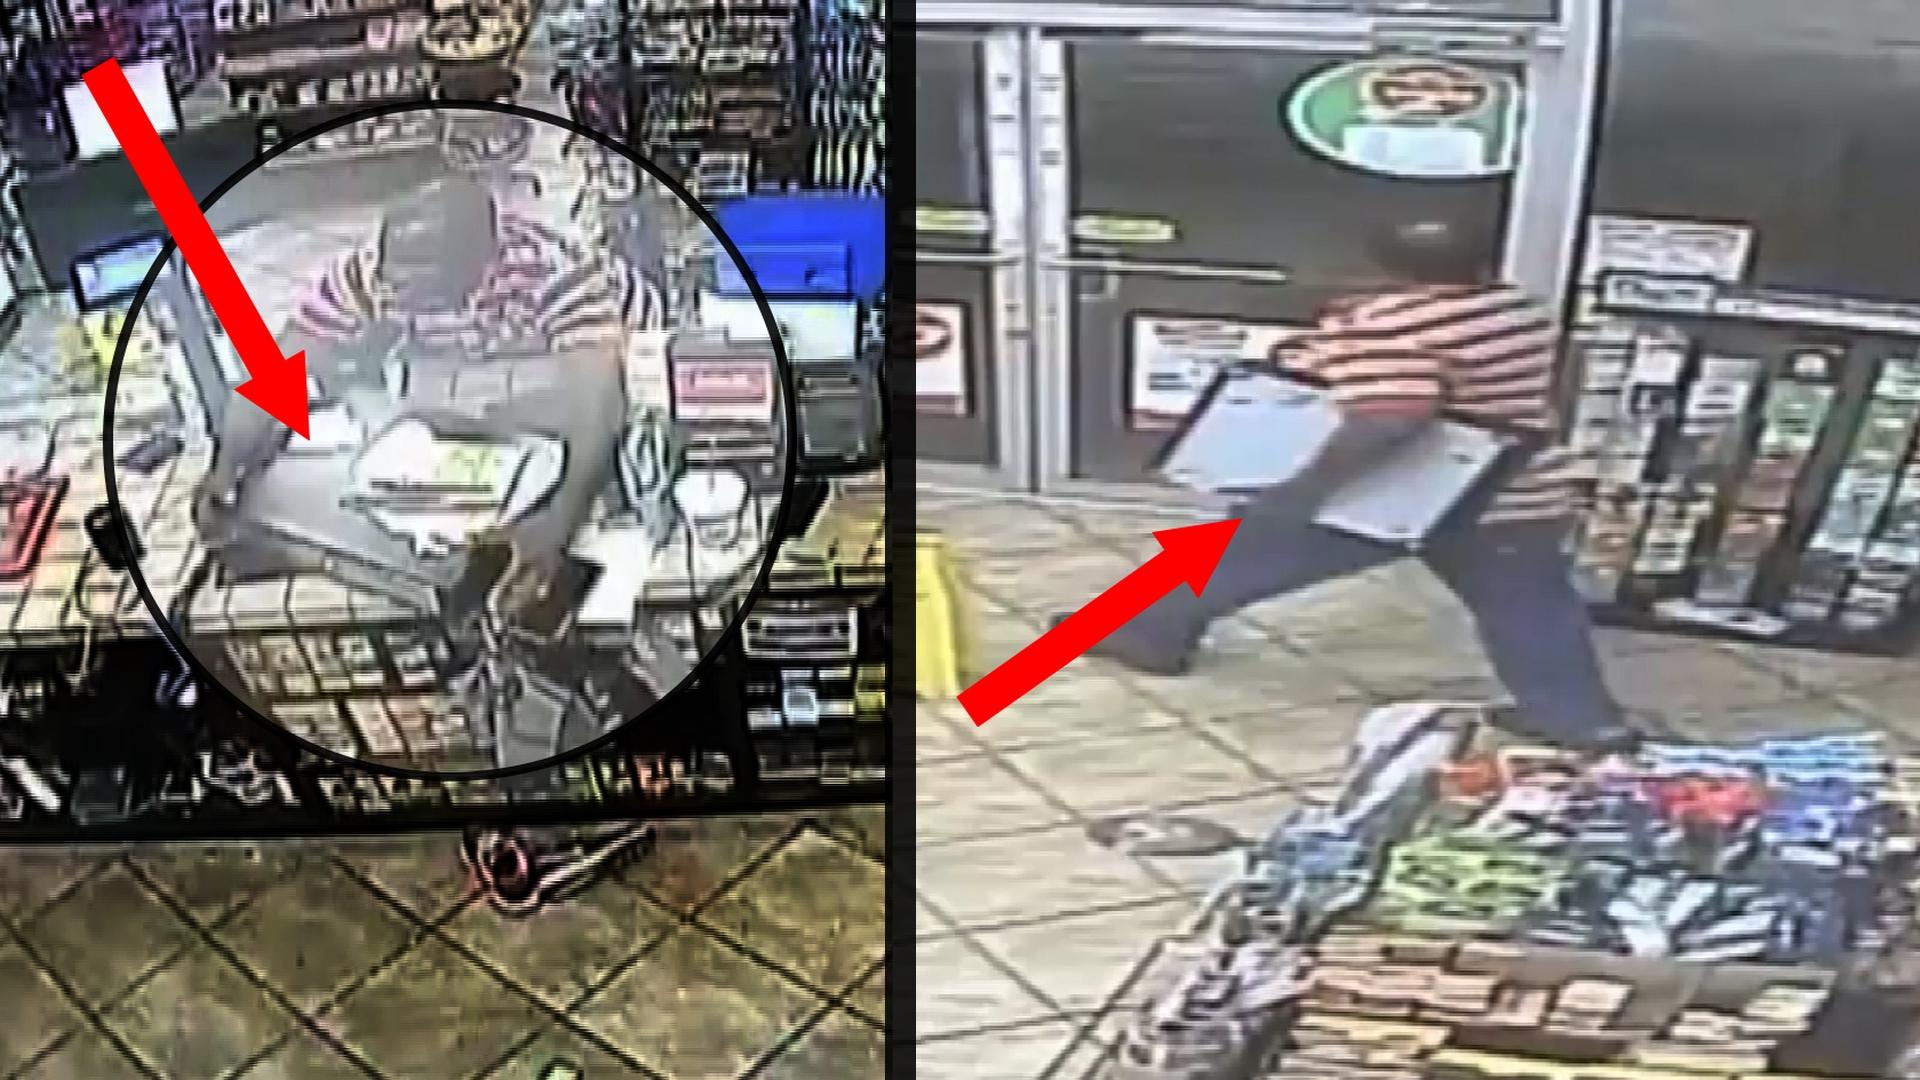 robbery21_1525970390728.jpg